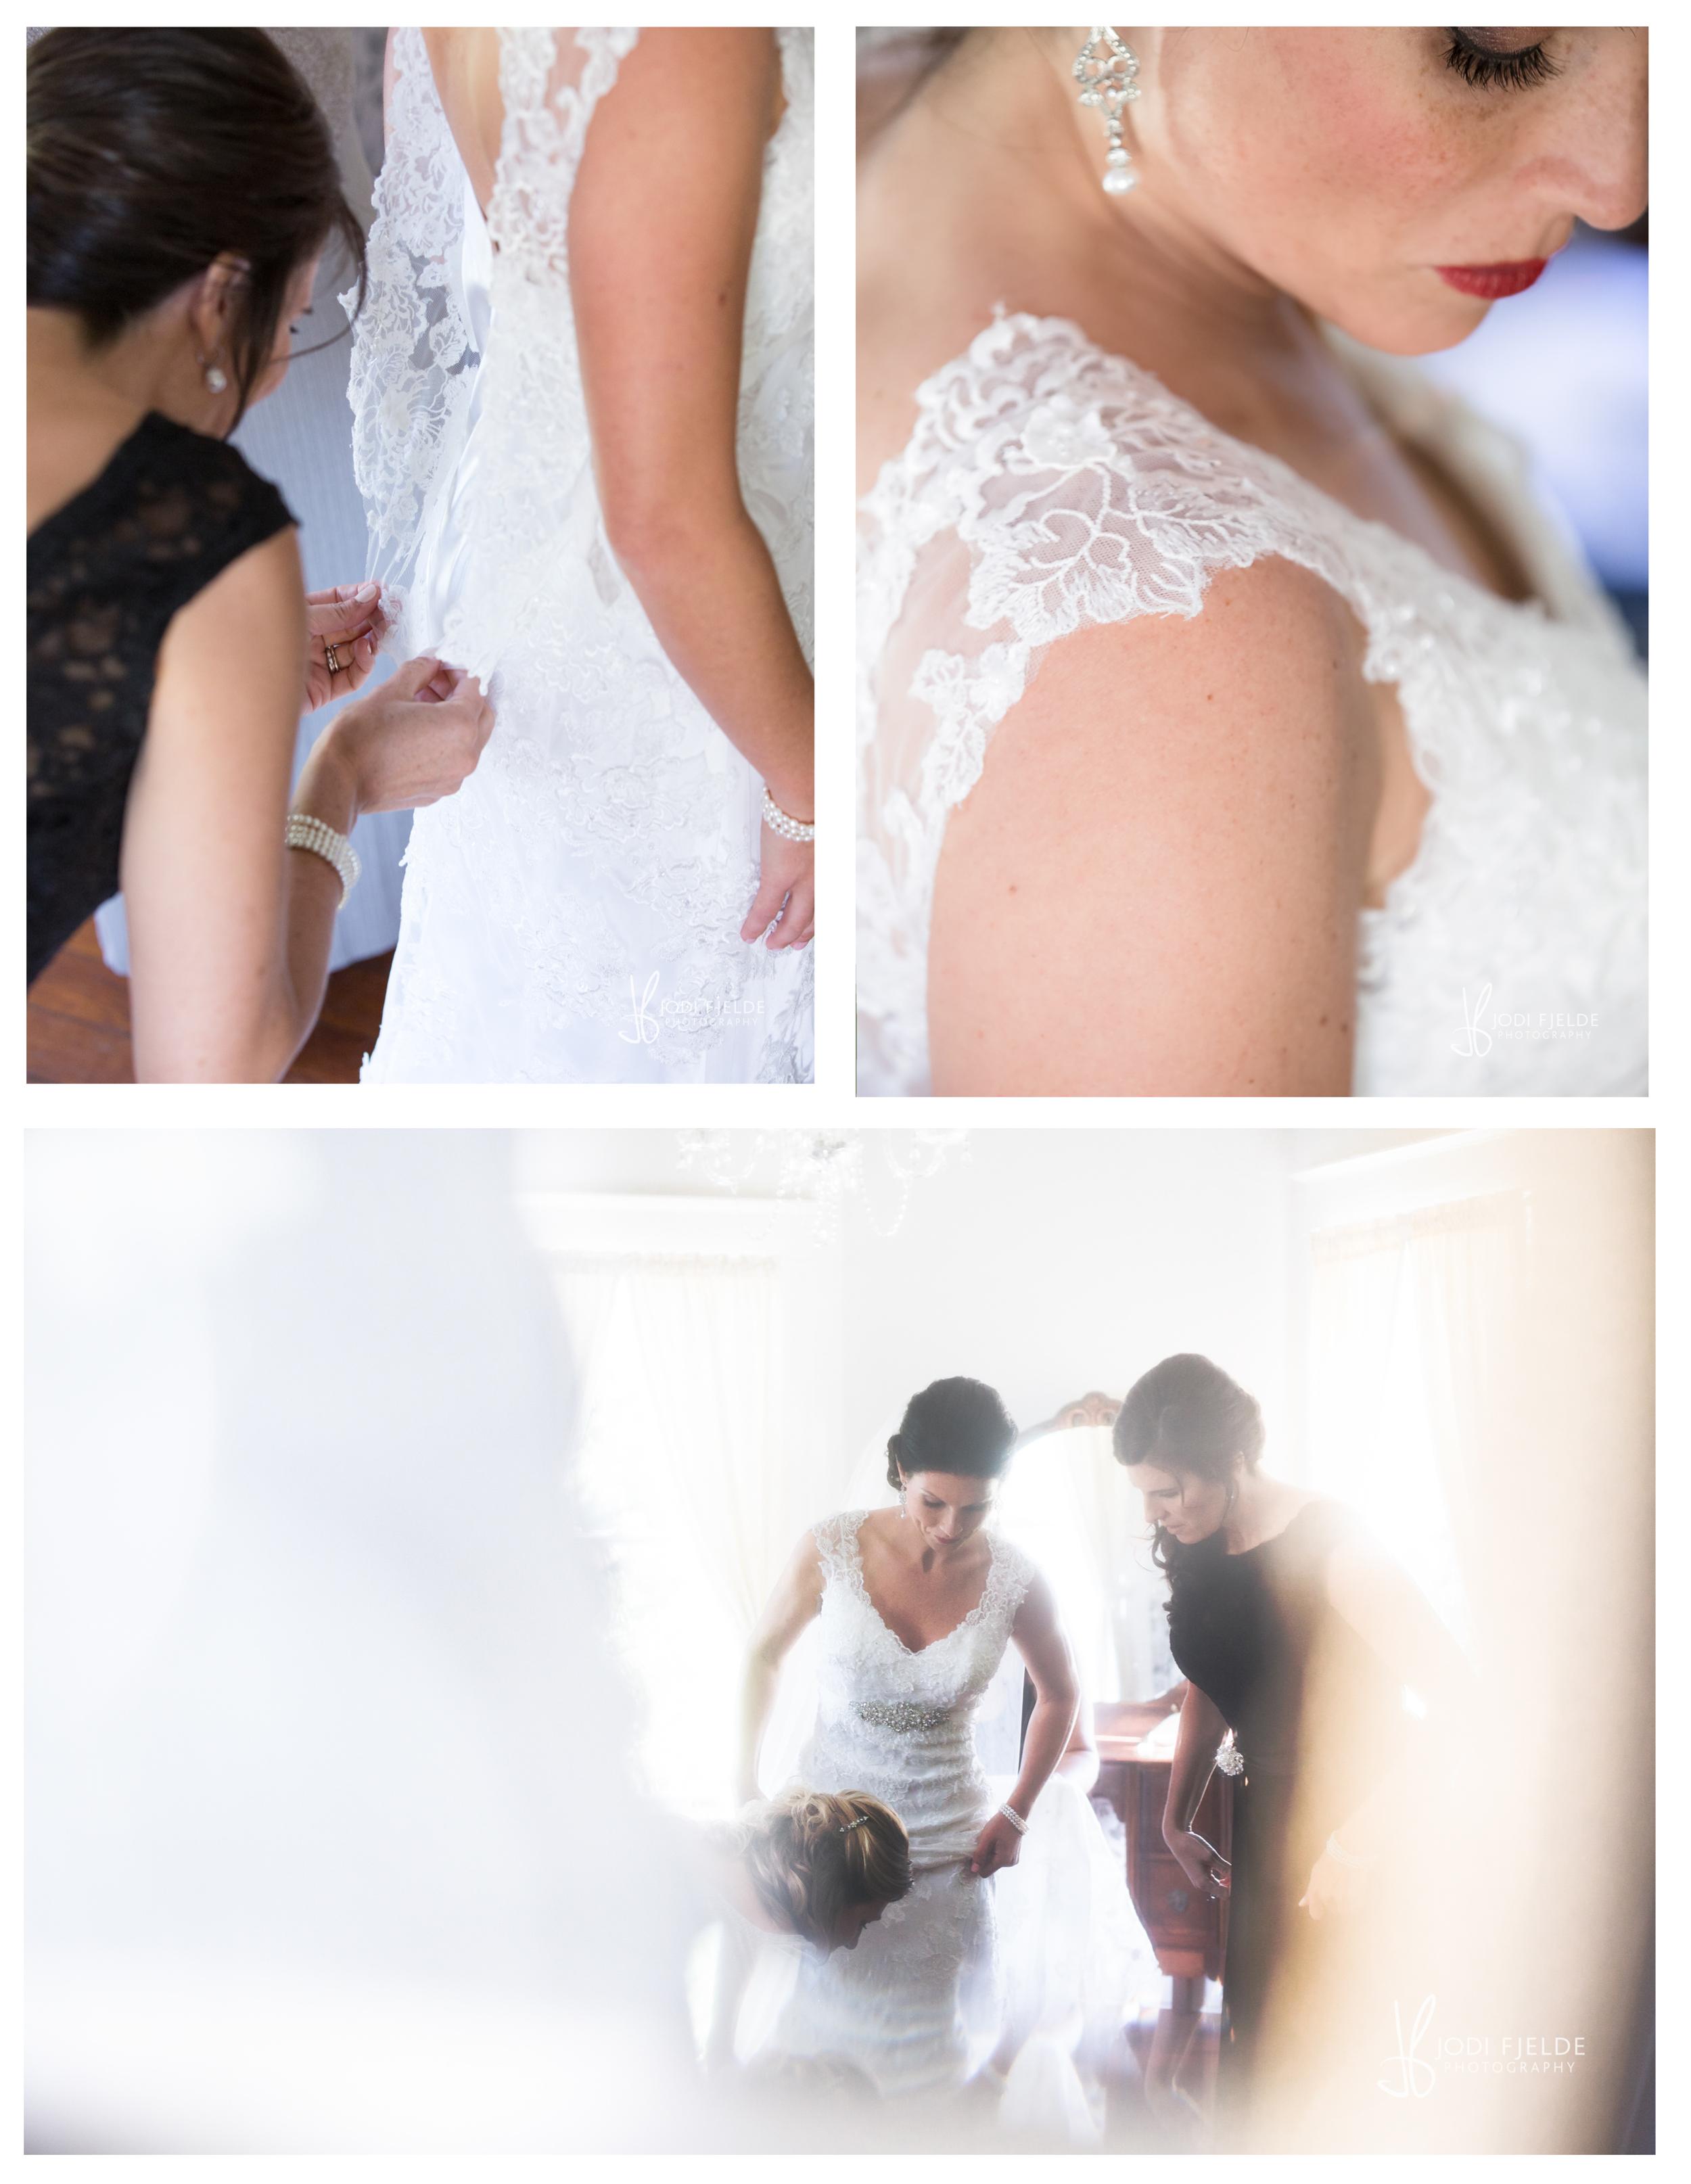 Highland_Manor_Apopka_Florida_wedding_Jackie_&_Tim_photography_jodi_Fjelde_photography-2.jpg